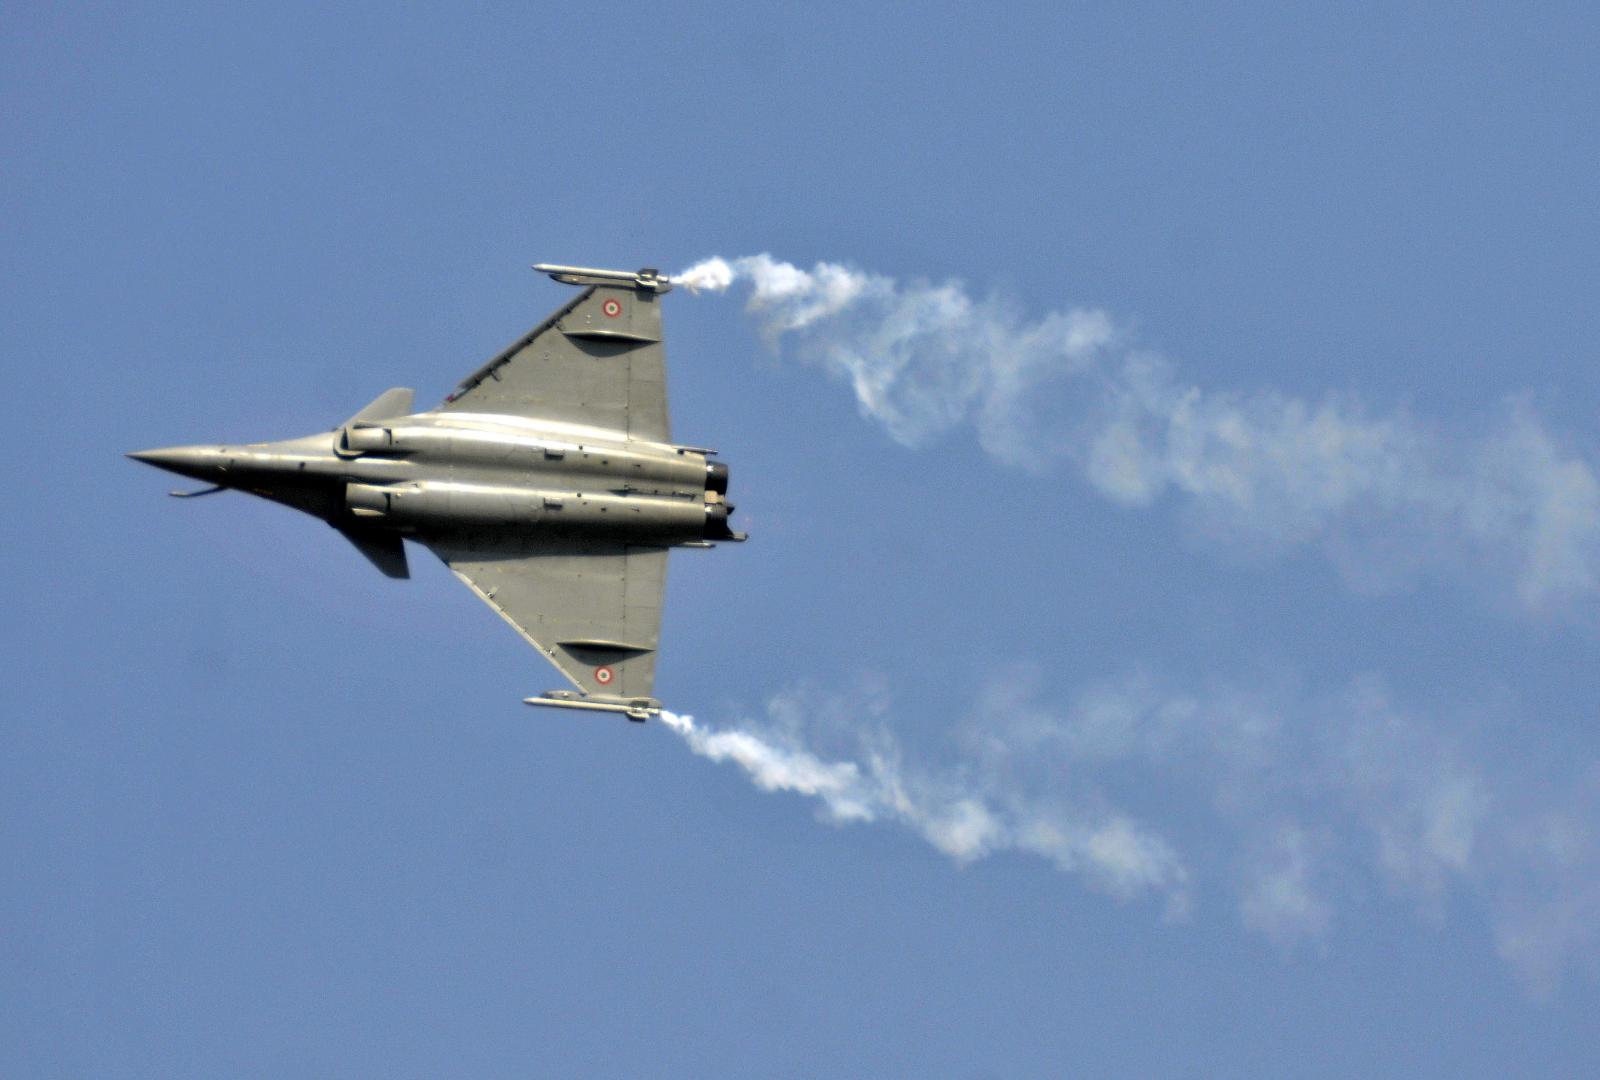 Aero India 2015 show and defence deals